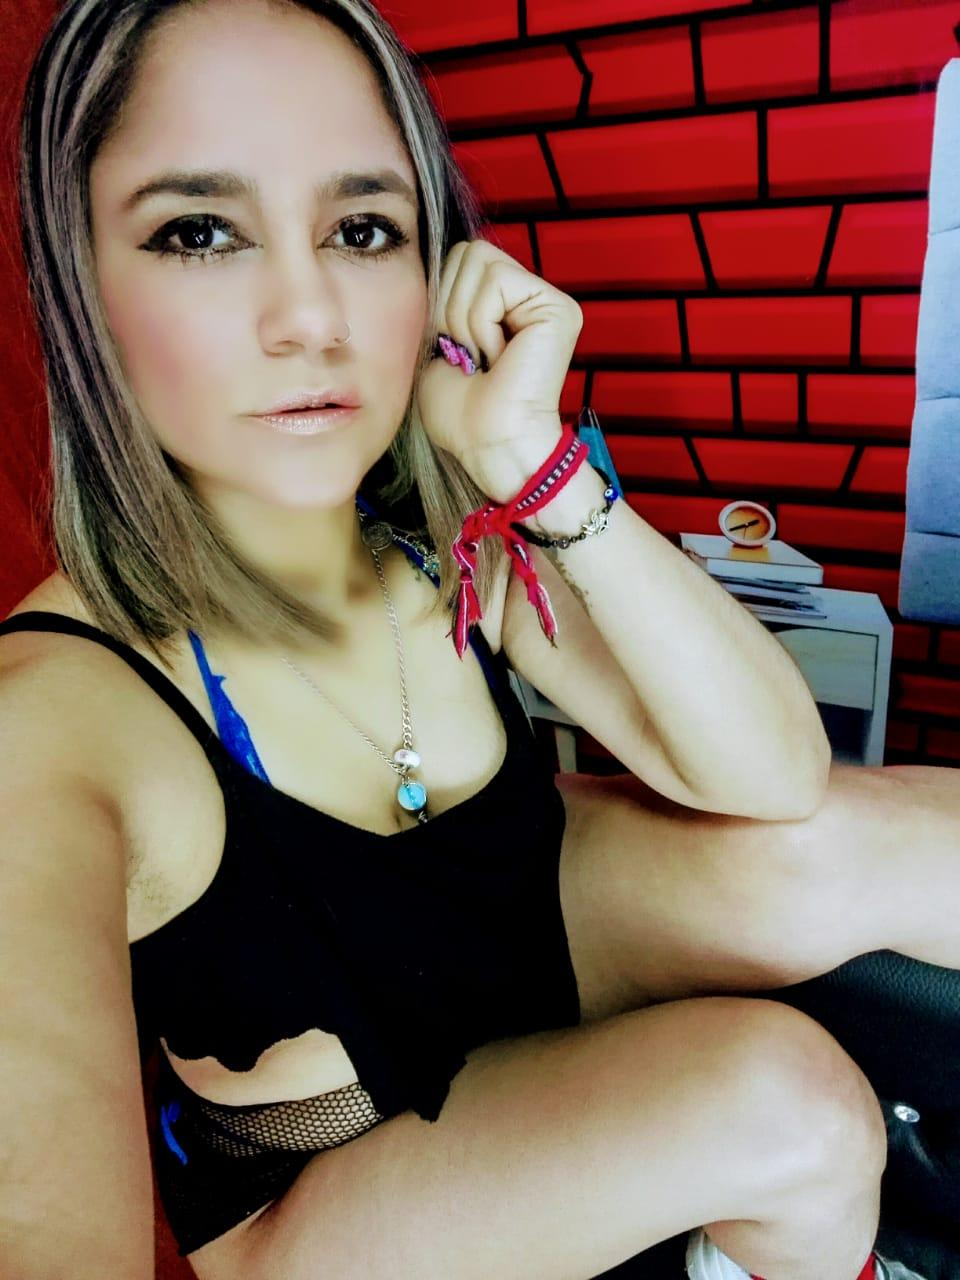 Camila rivero?s=4yn7xh0vvn0znkctfaoisgn8jr3ifyg6hcjwpzokhke=